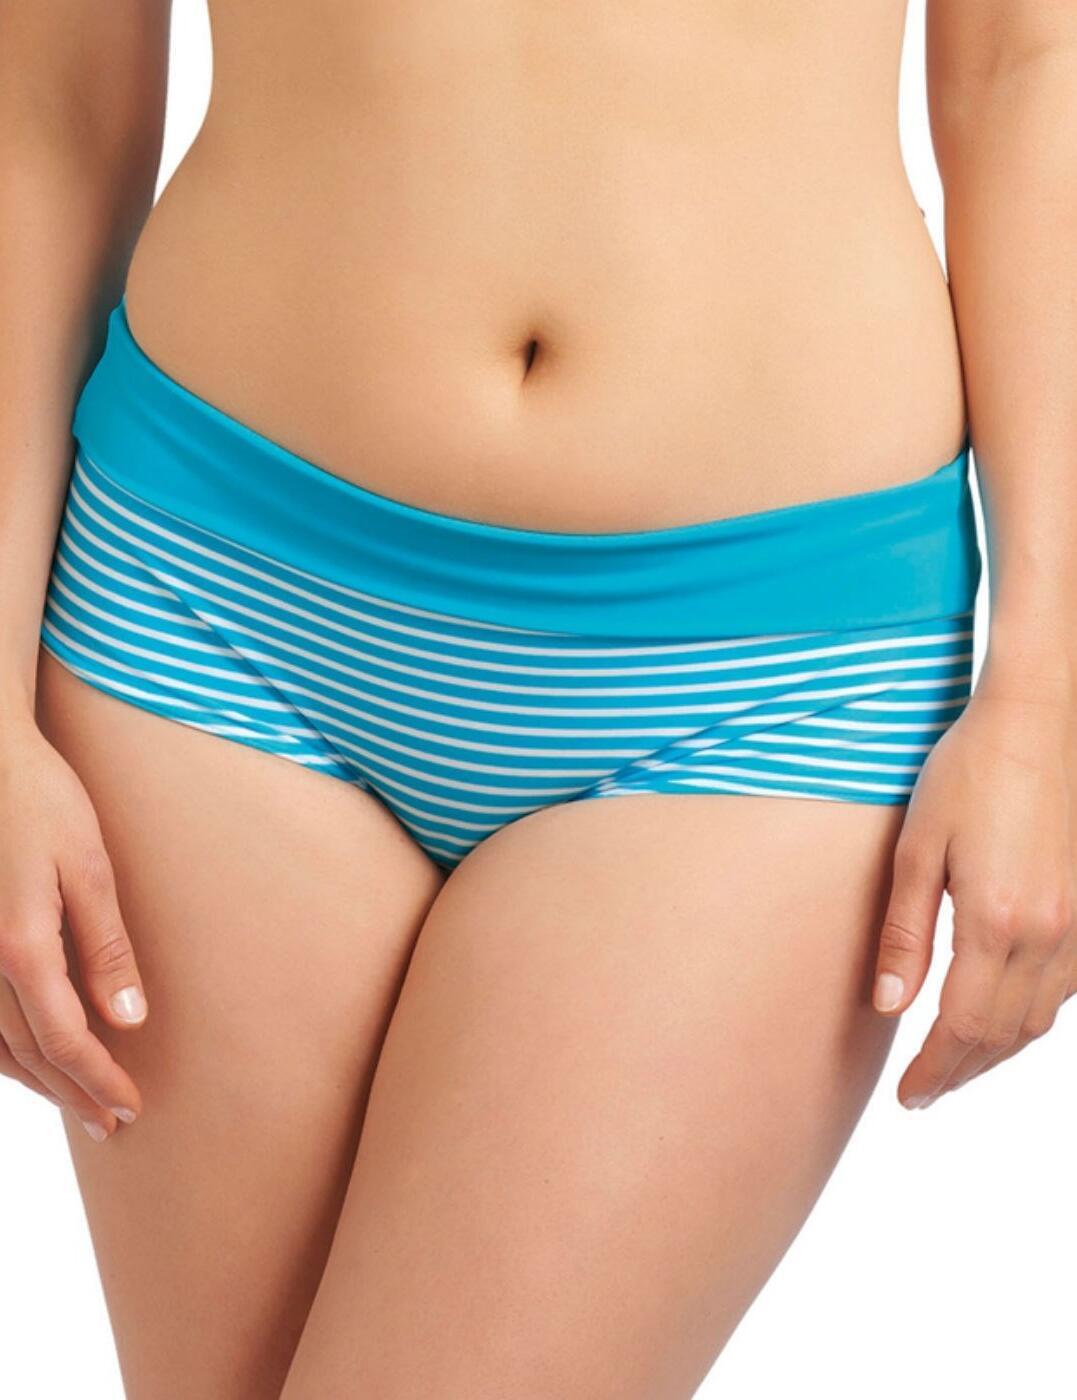 3606 Freya Tootsie Fold Bikini Short - 3606 Azure